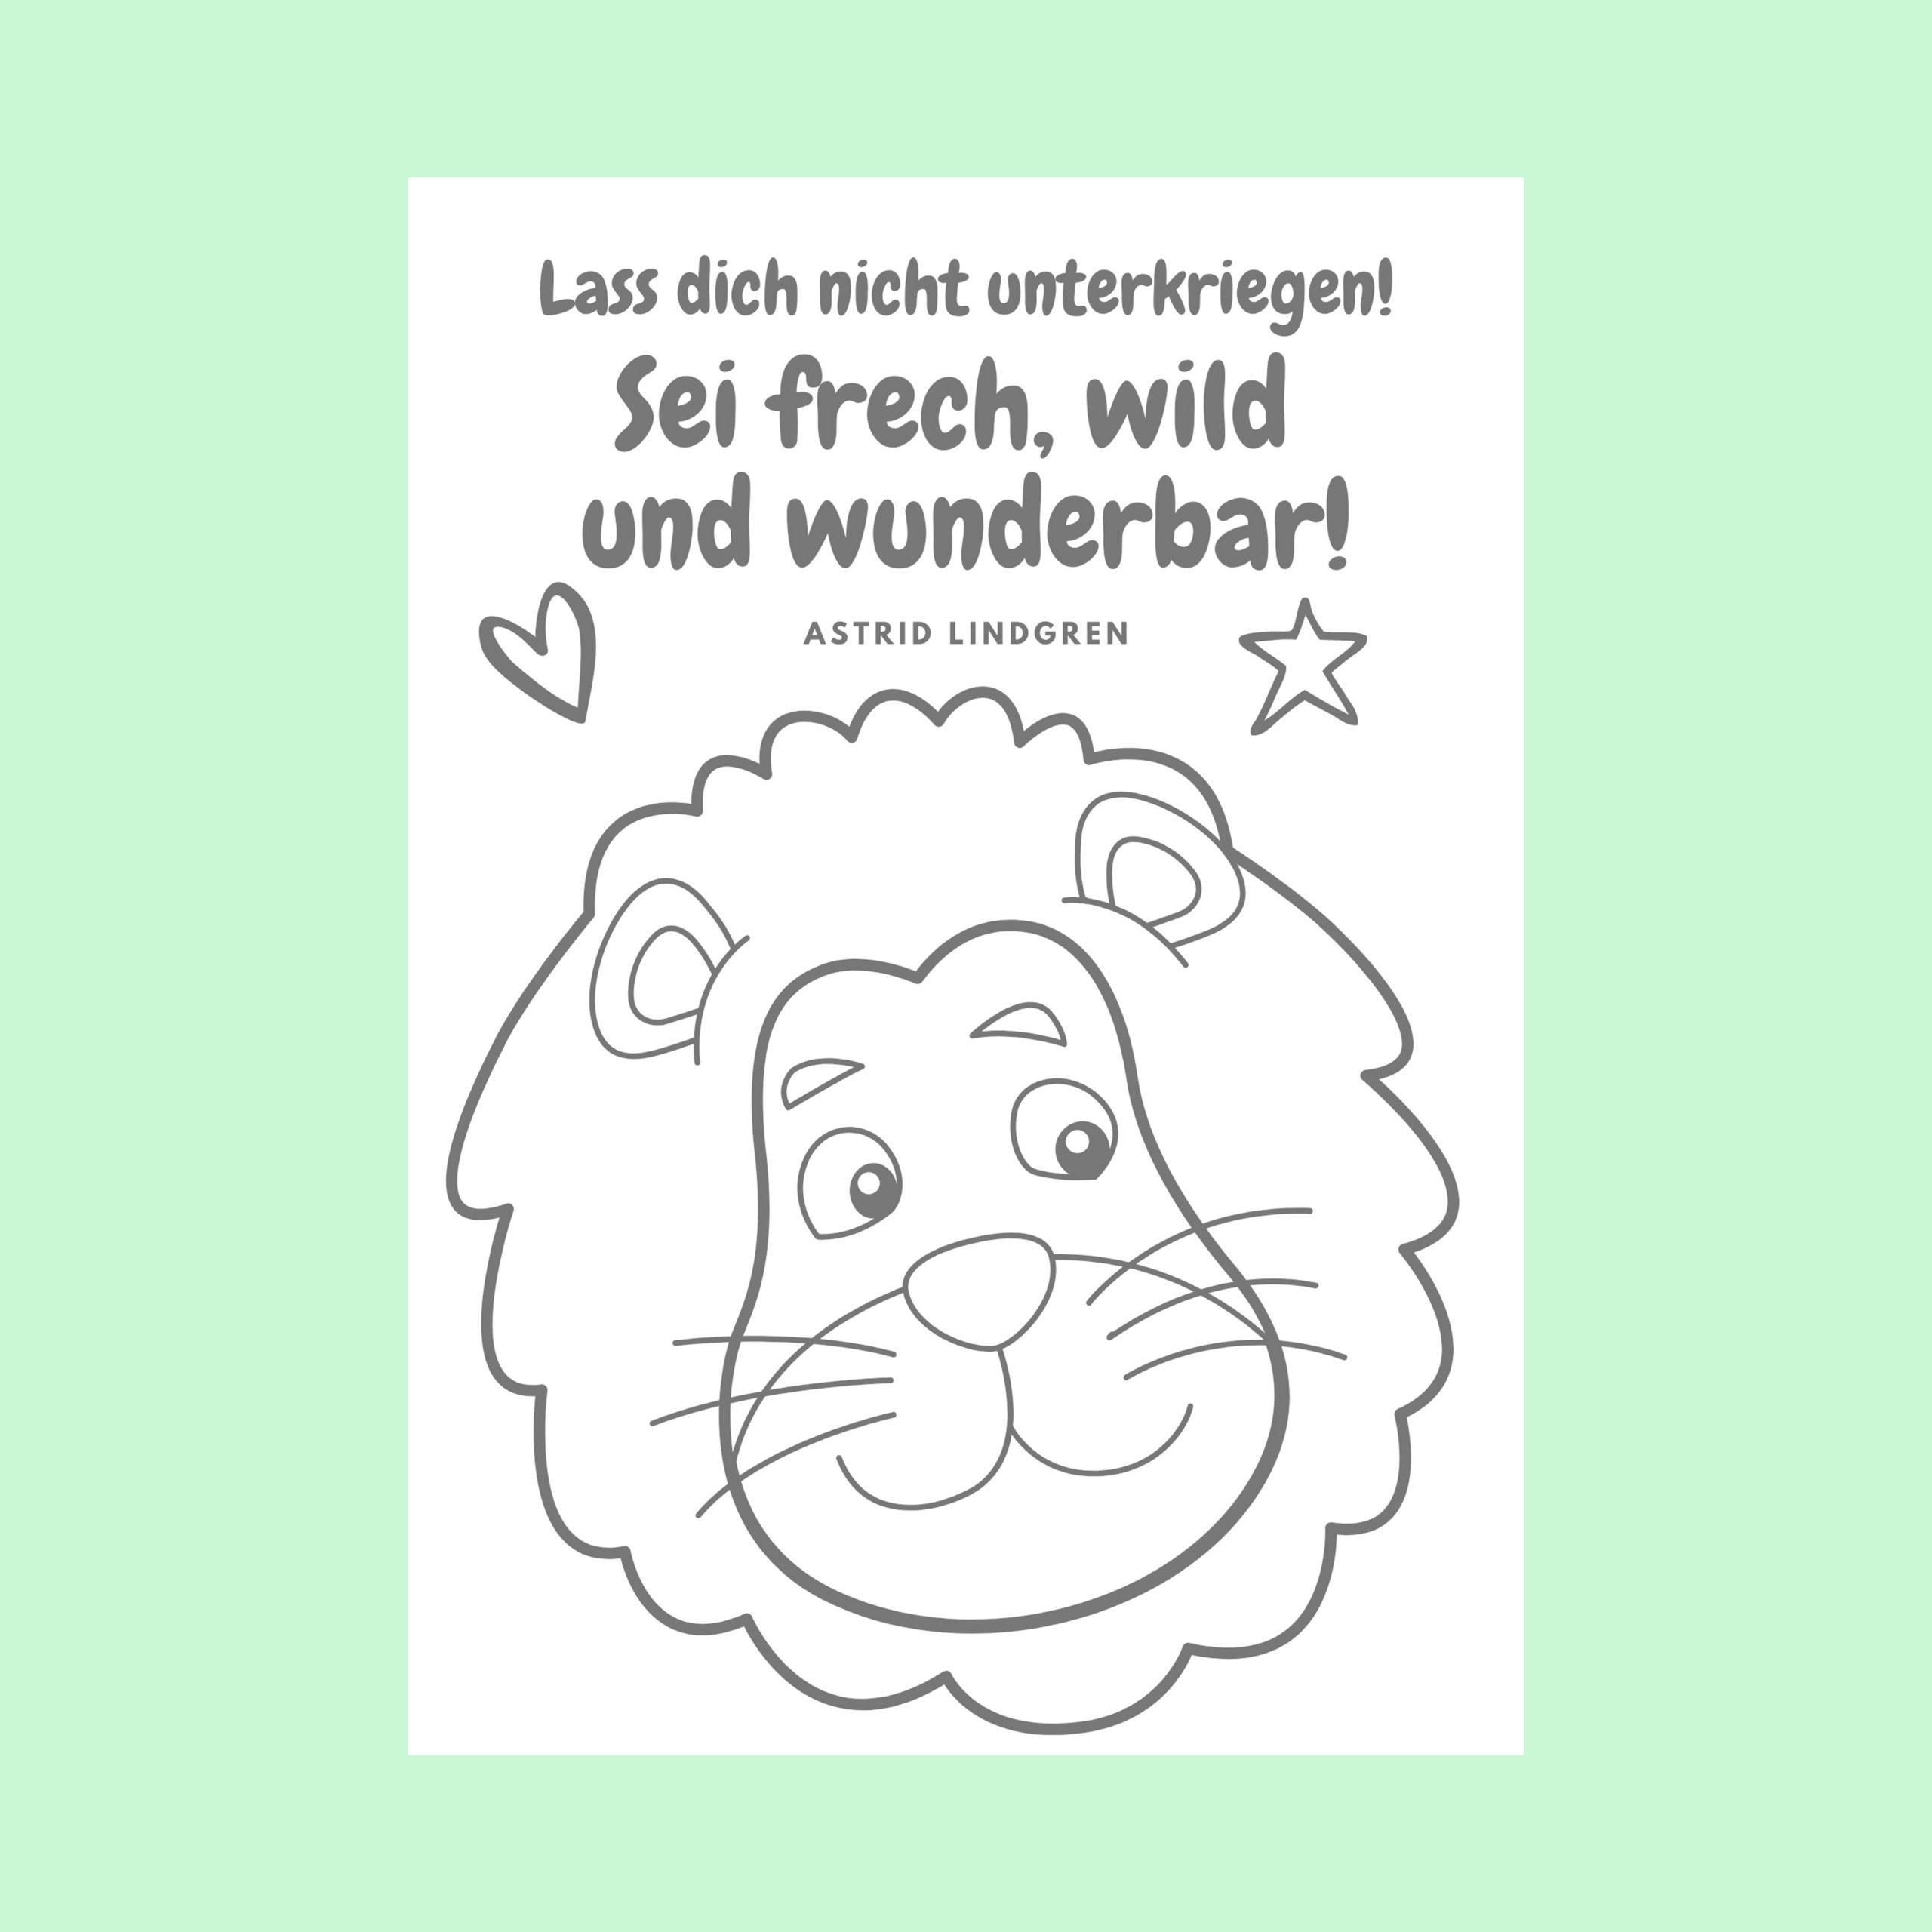 Löwen DIY Poster Ausmalbild